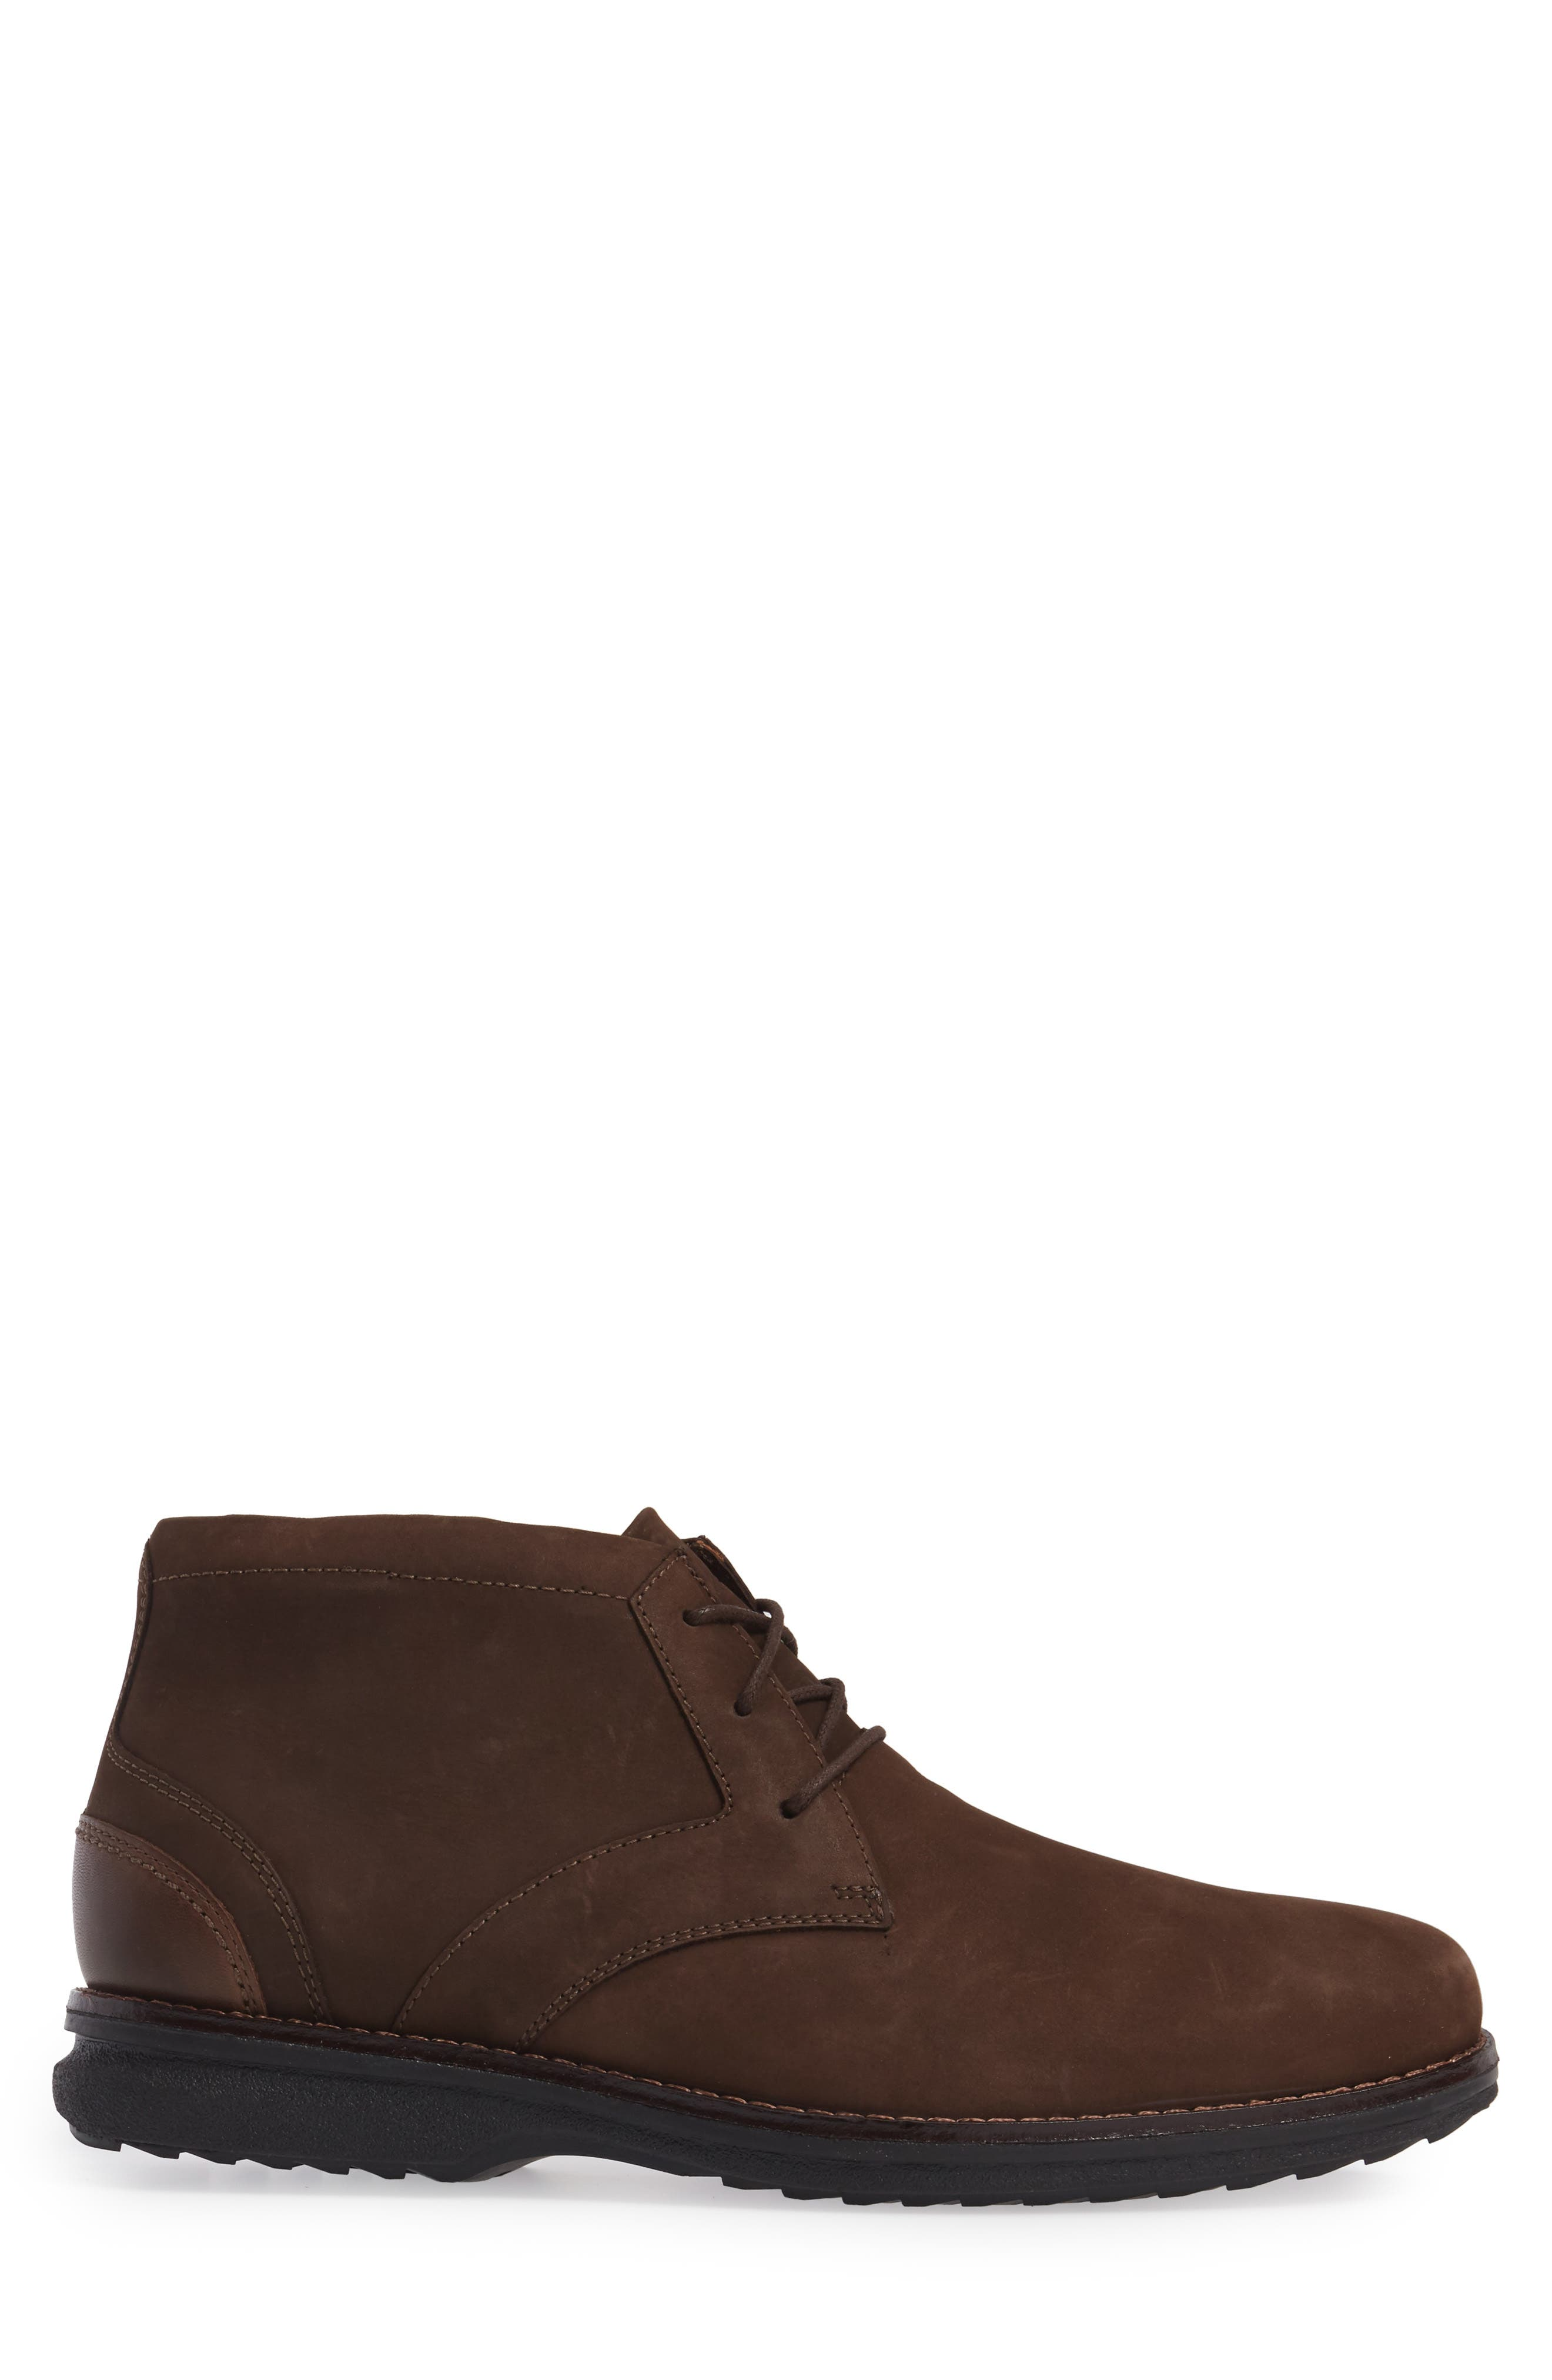 Premium Class Chukka Boot,                             Alternate thumbnail 3, color,                             Brown Nubuck